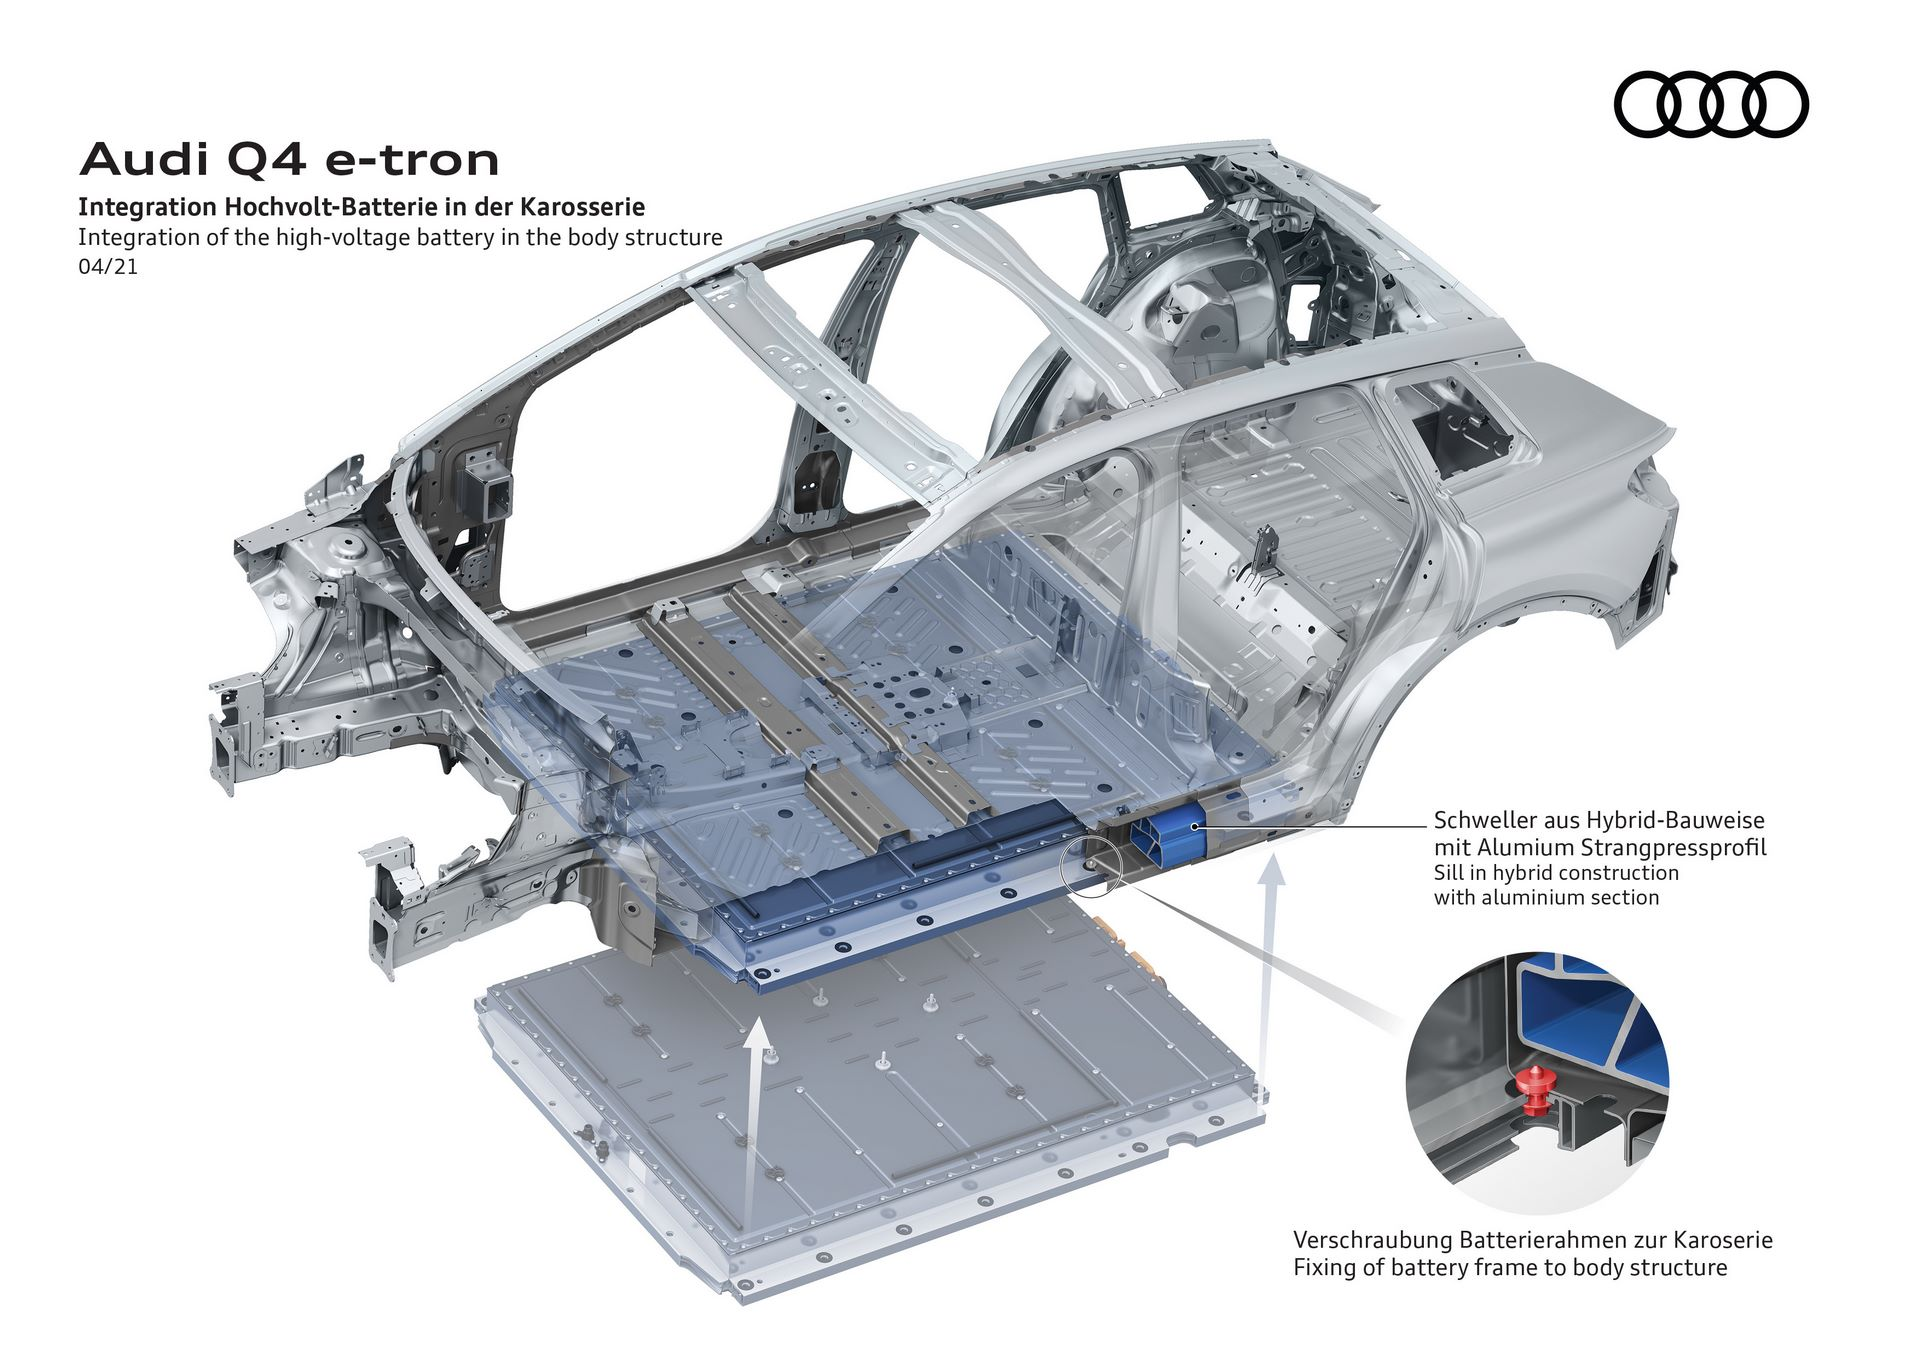 Audi-Q4-e-tron-and-Q4-e-tron-Sportback-111